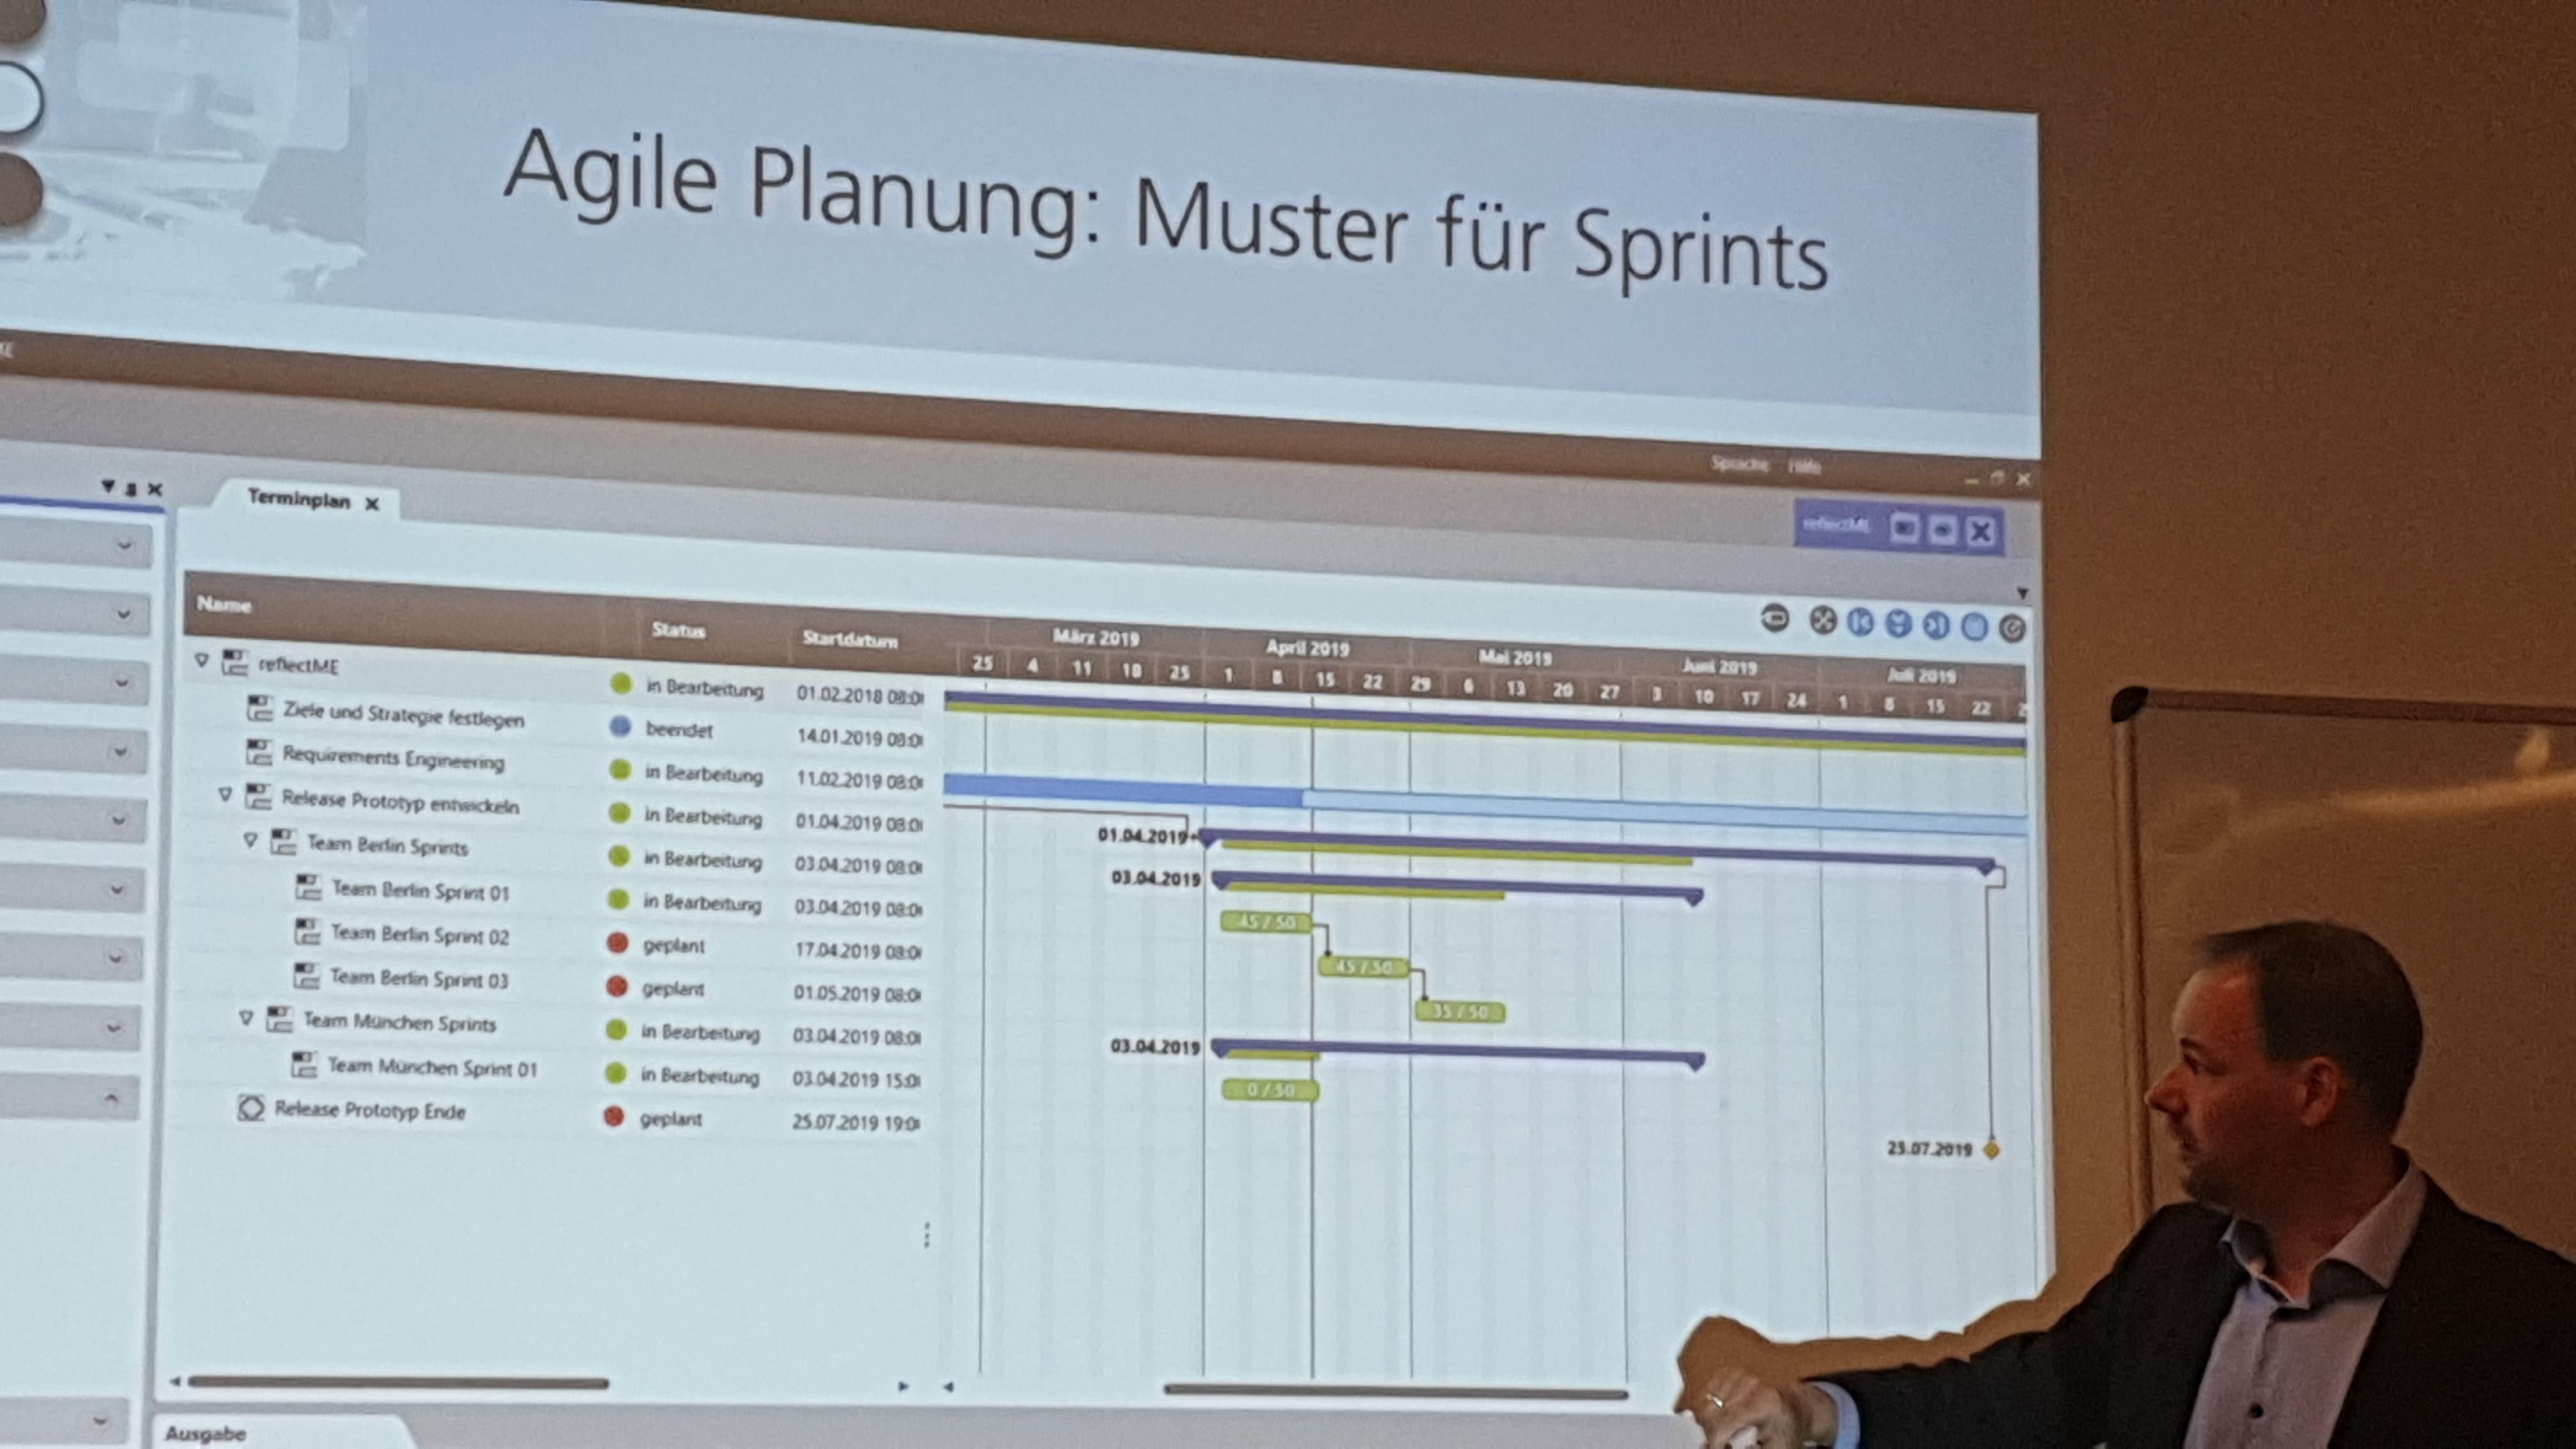 Agiles Planung mit Muster für Sprints